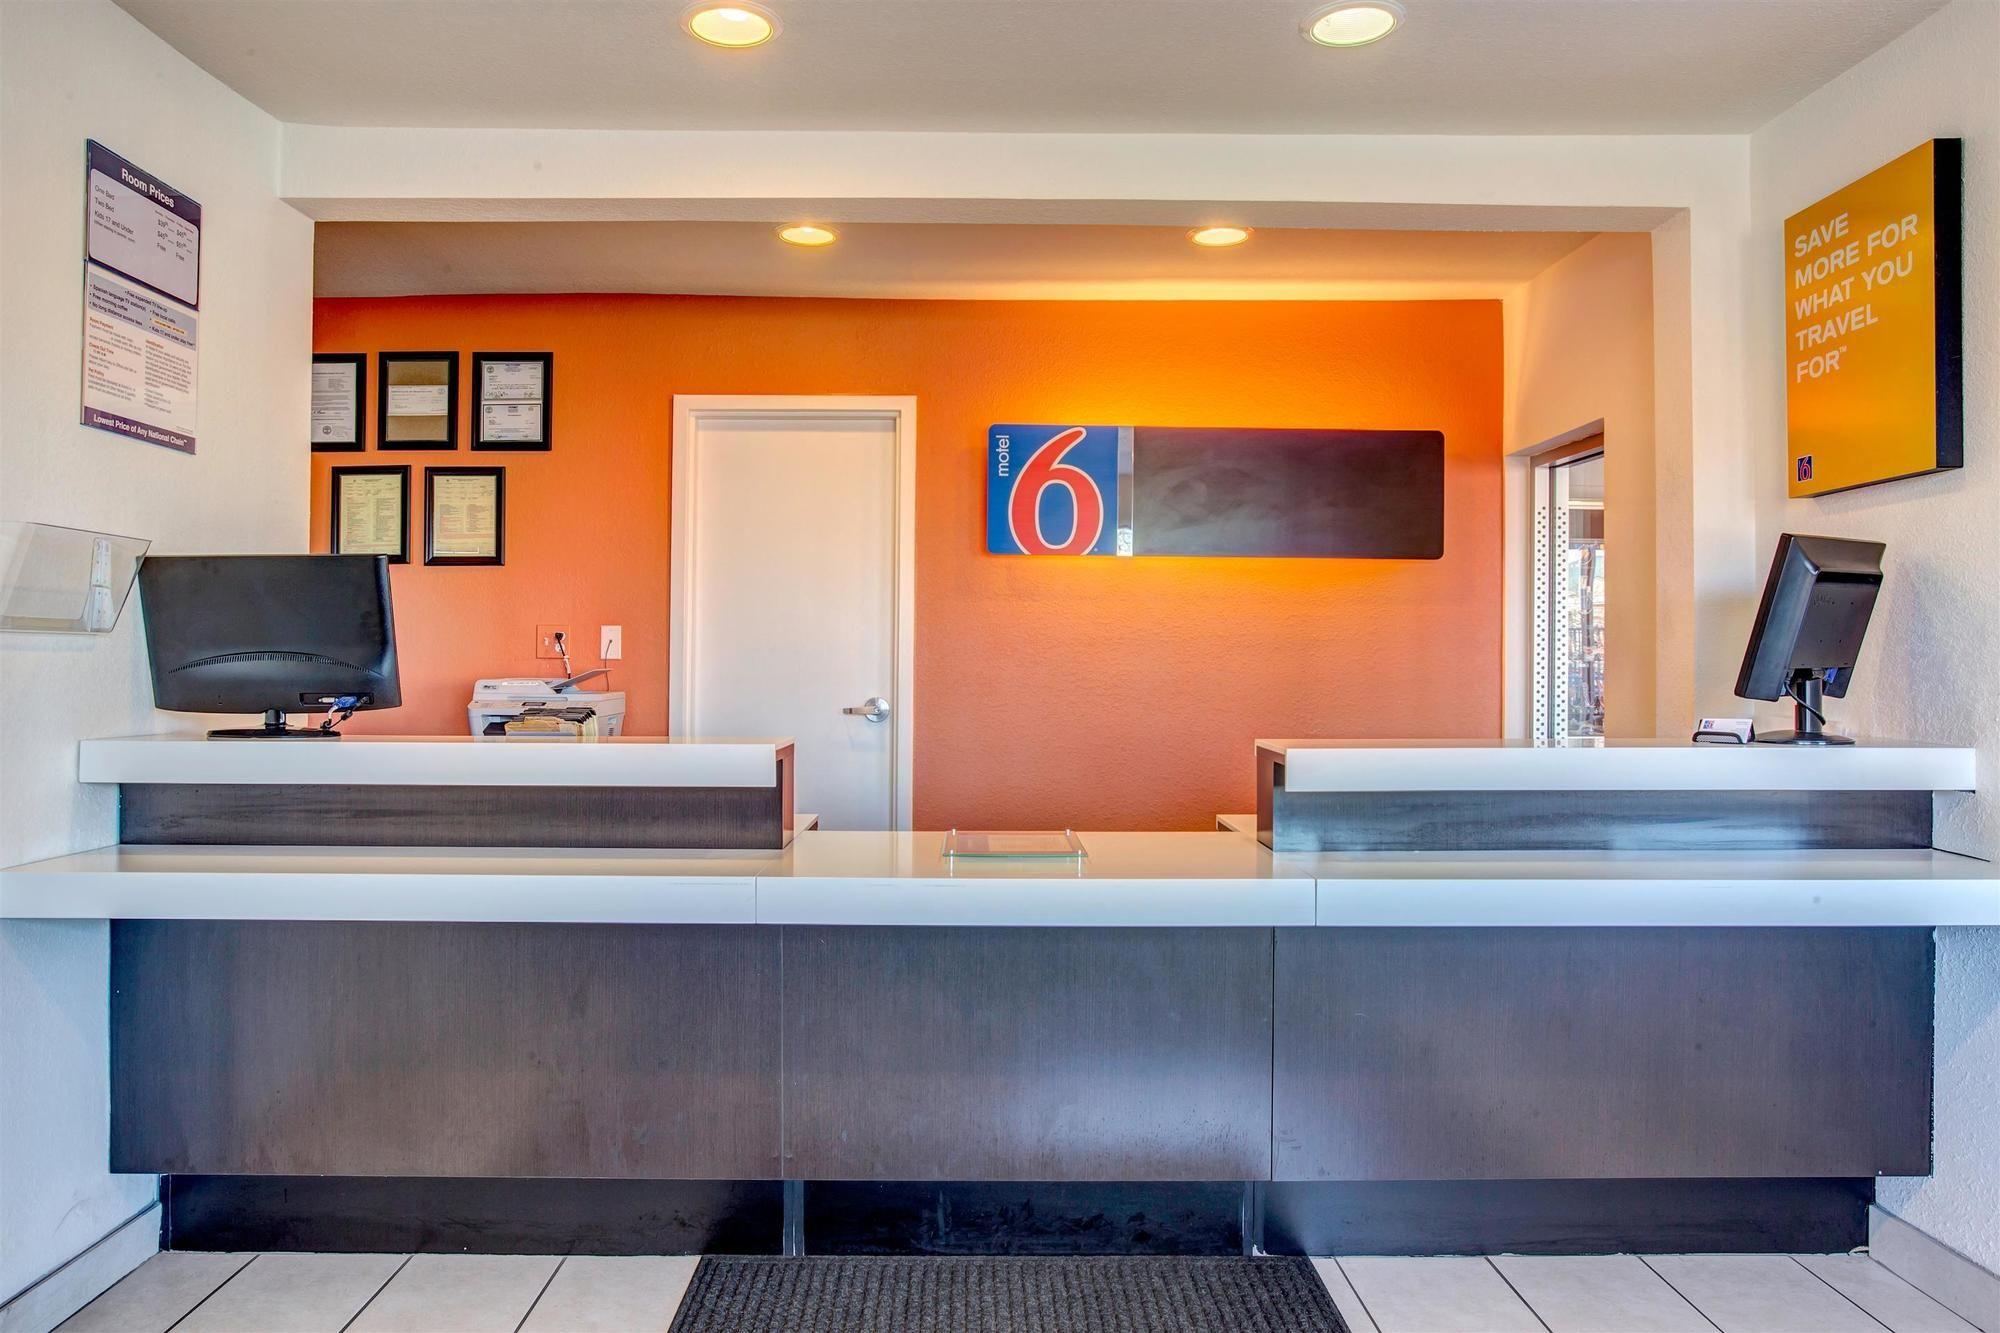 Motel 6 Murfreesboro in Murfreesboro, TN